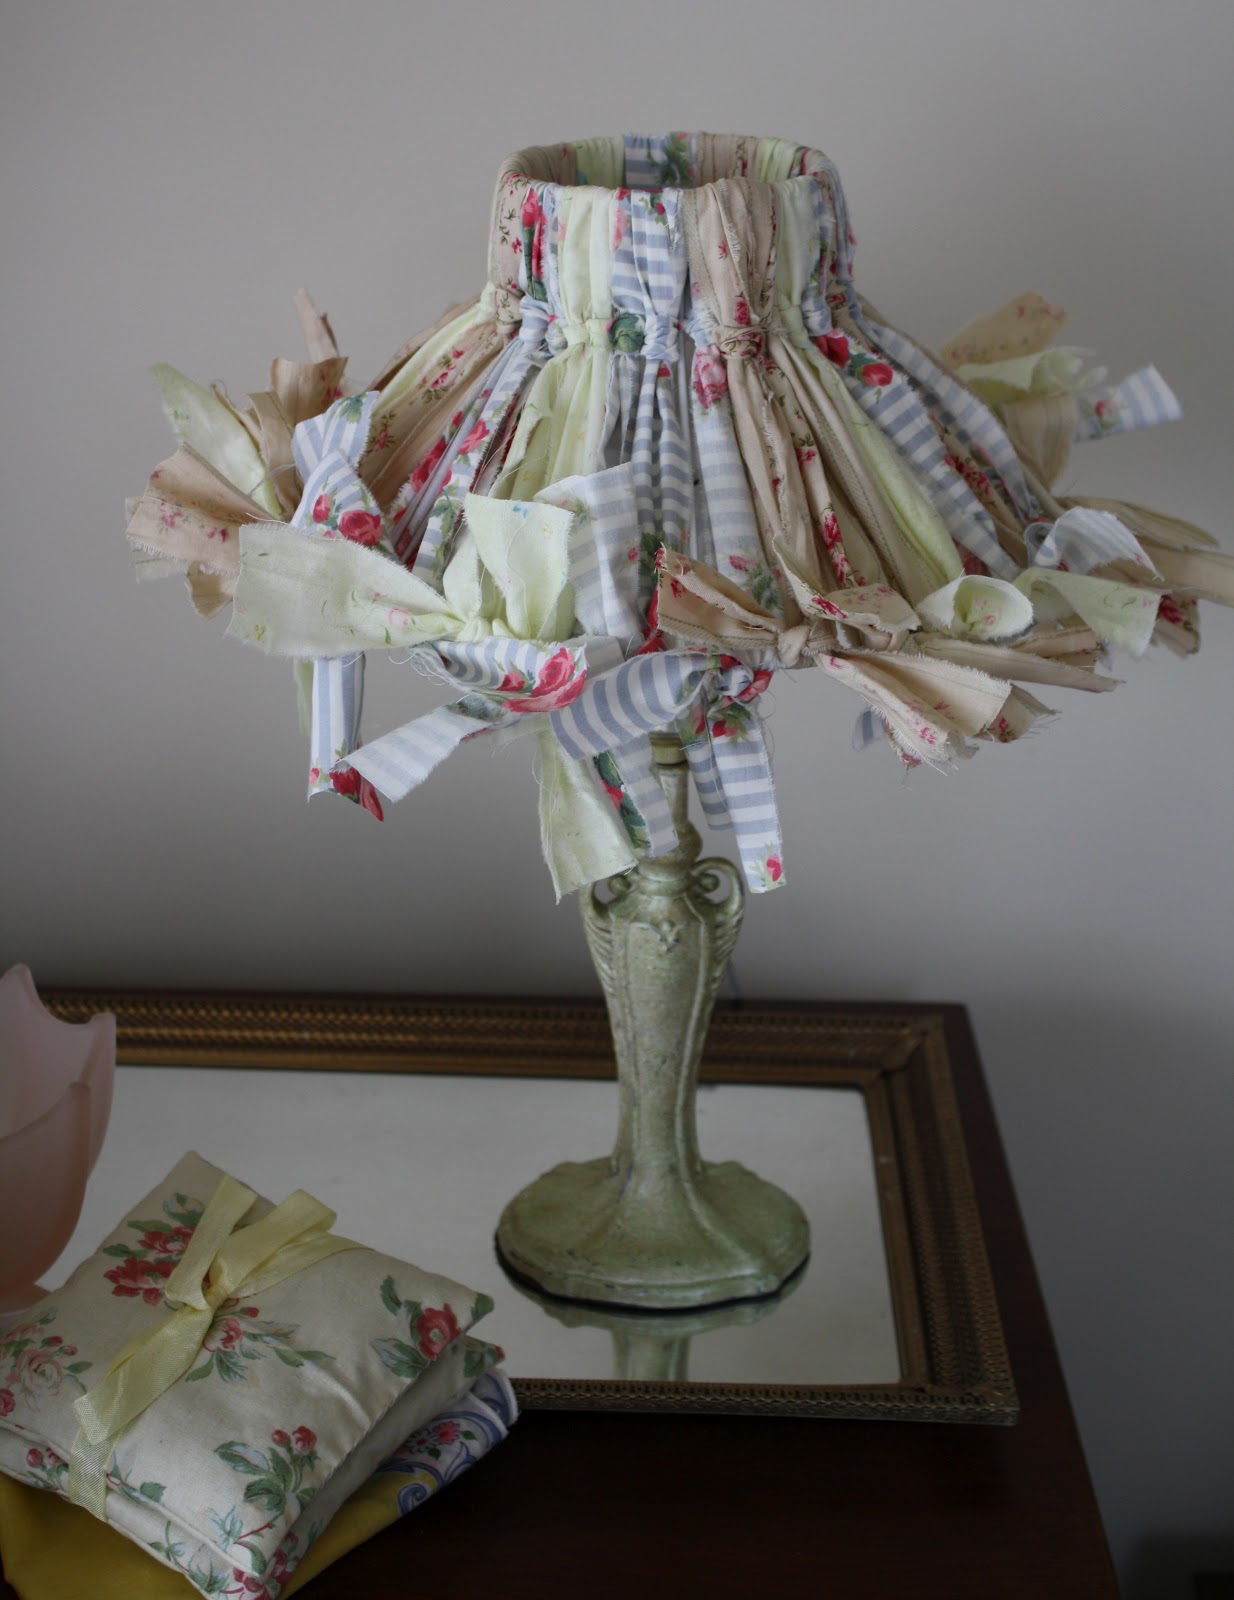 UMELECKY : Handmade Shabby Chic Projects